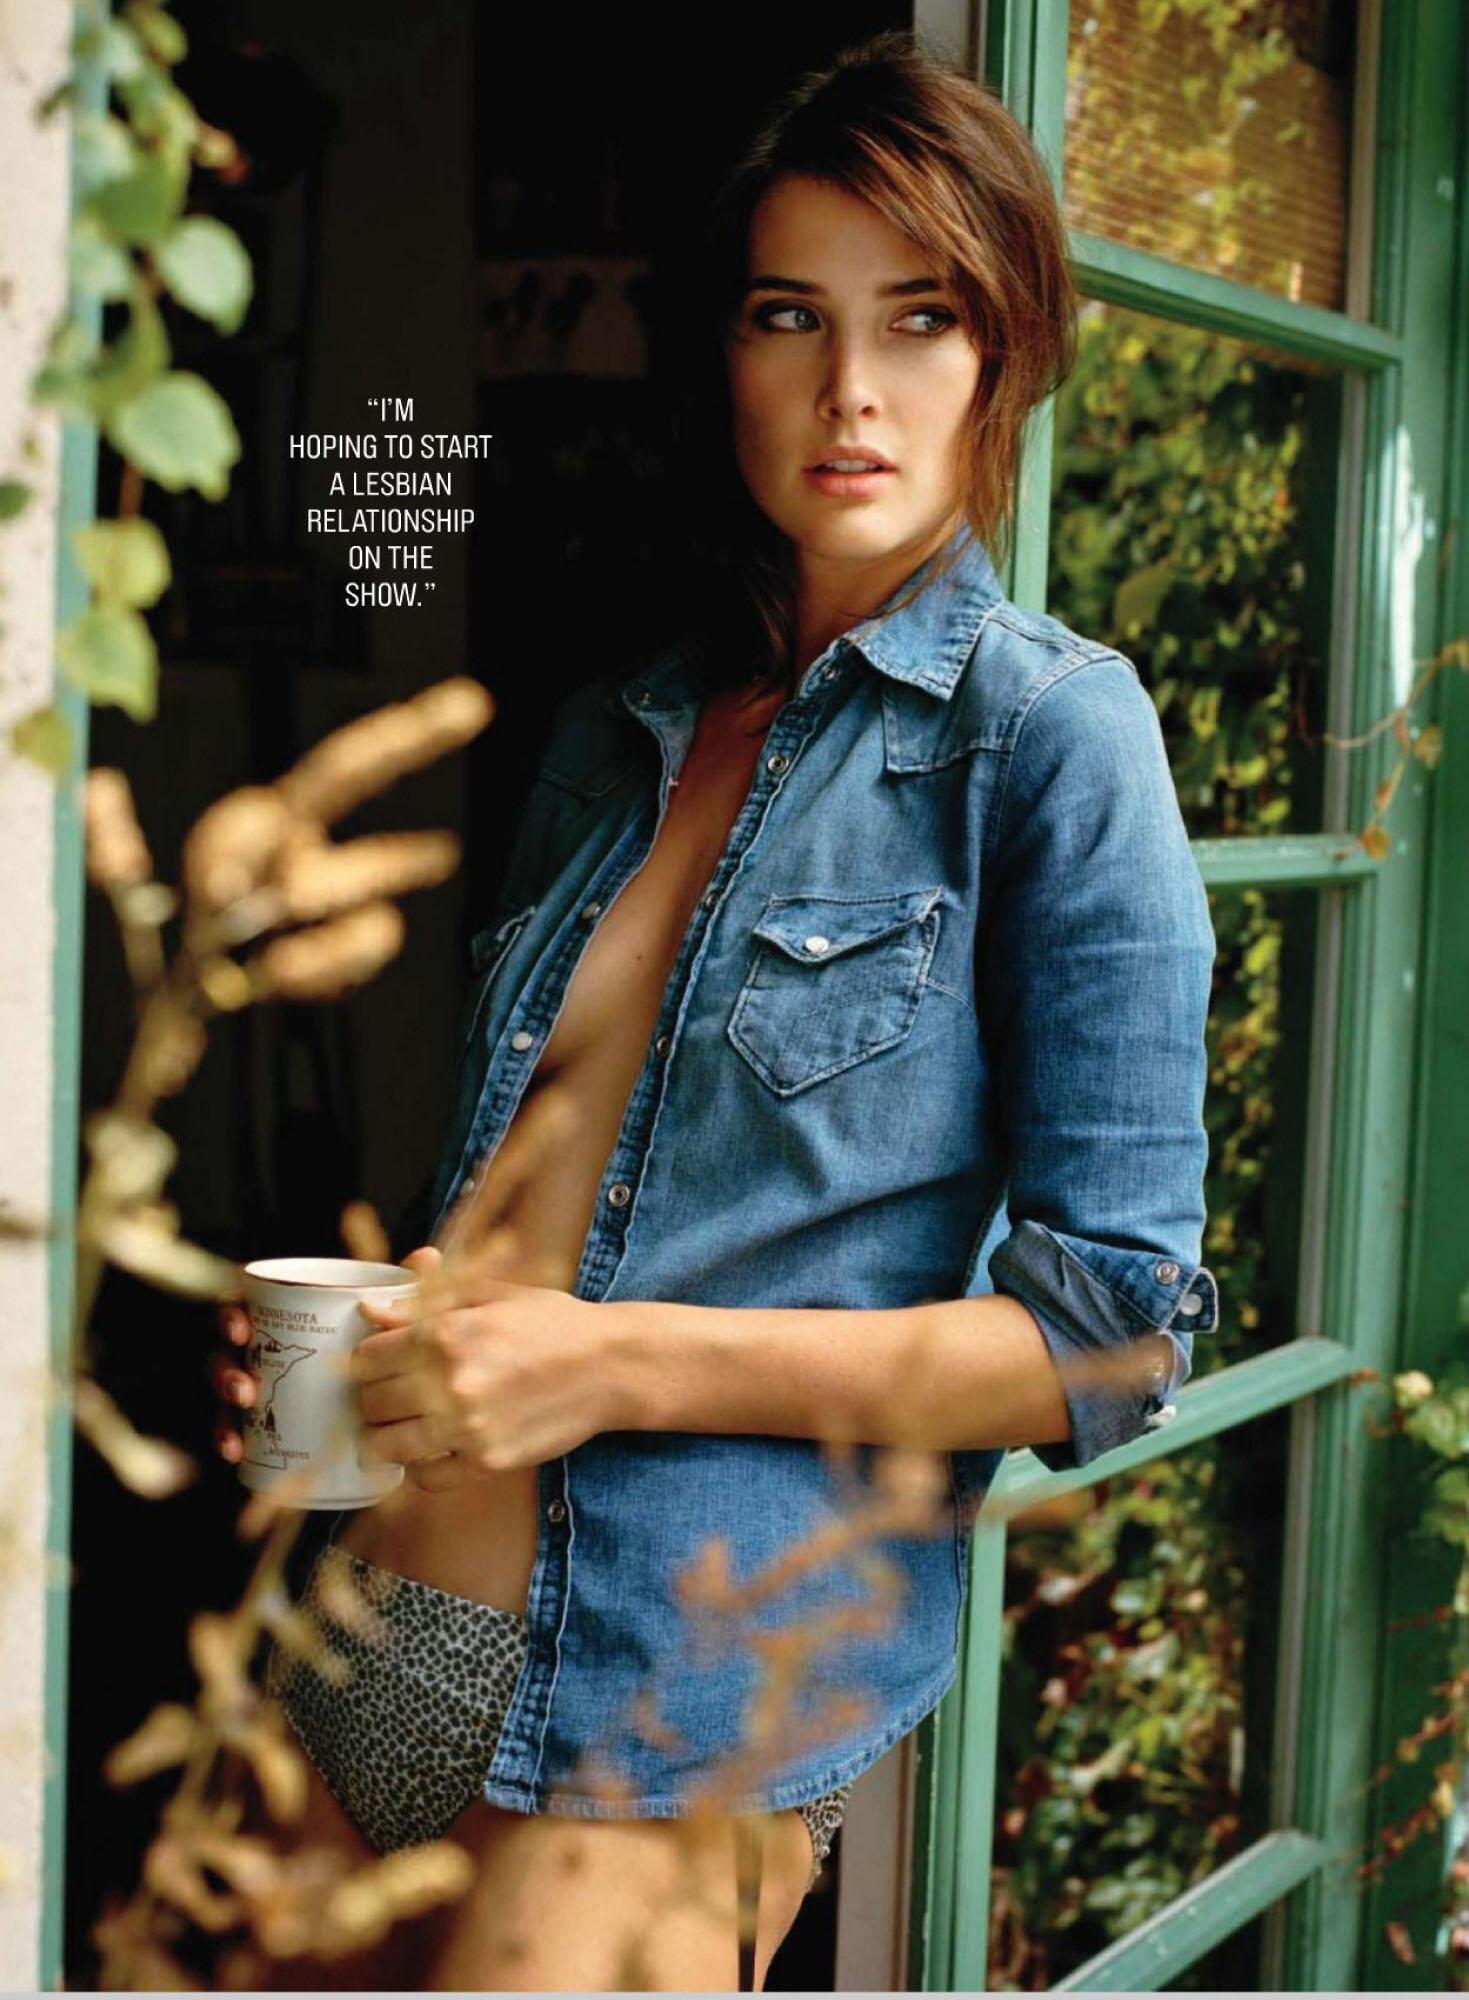 Cobie Smulders's quote #4